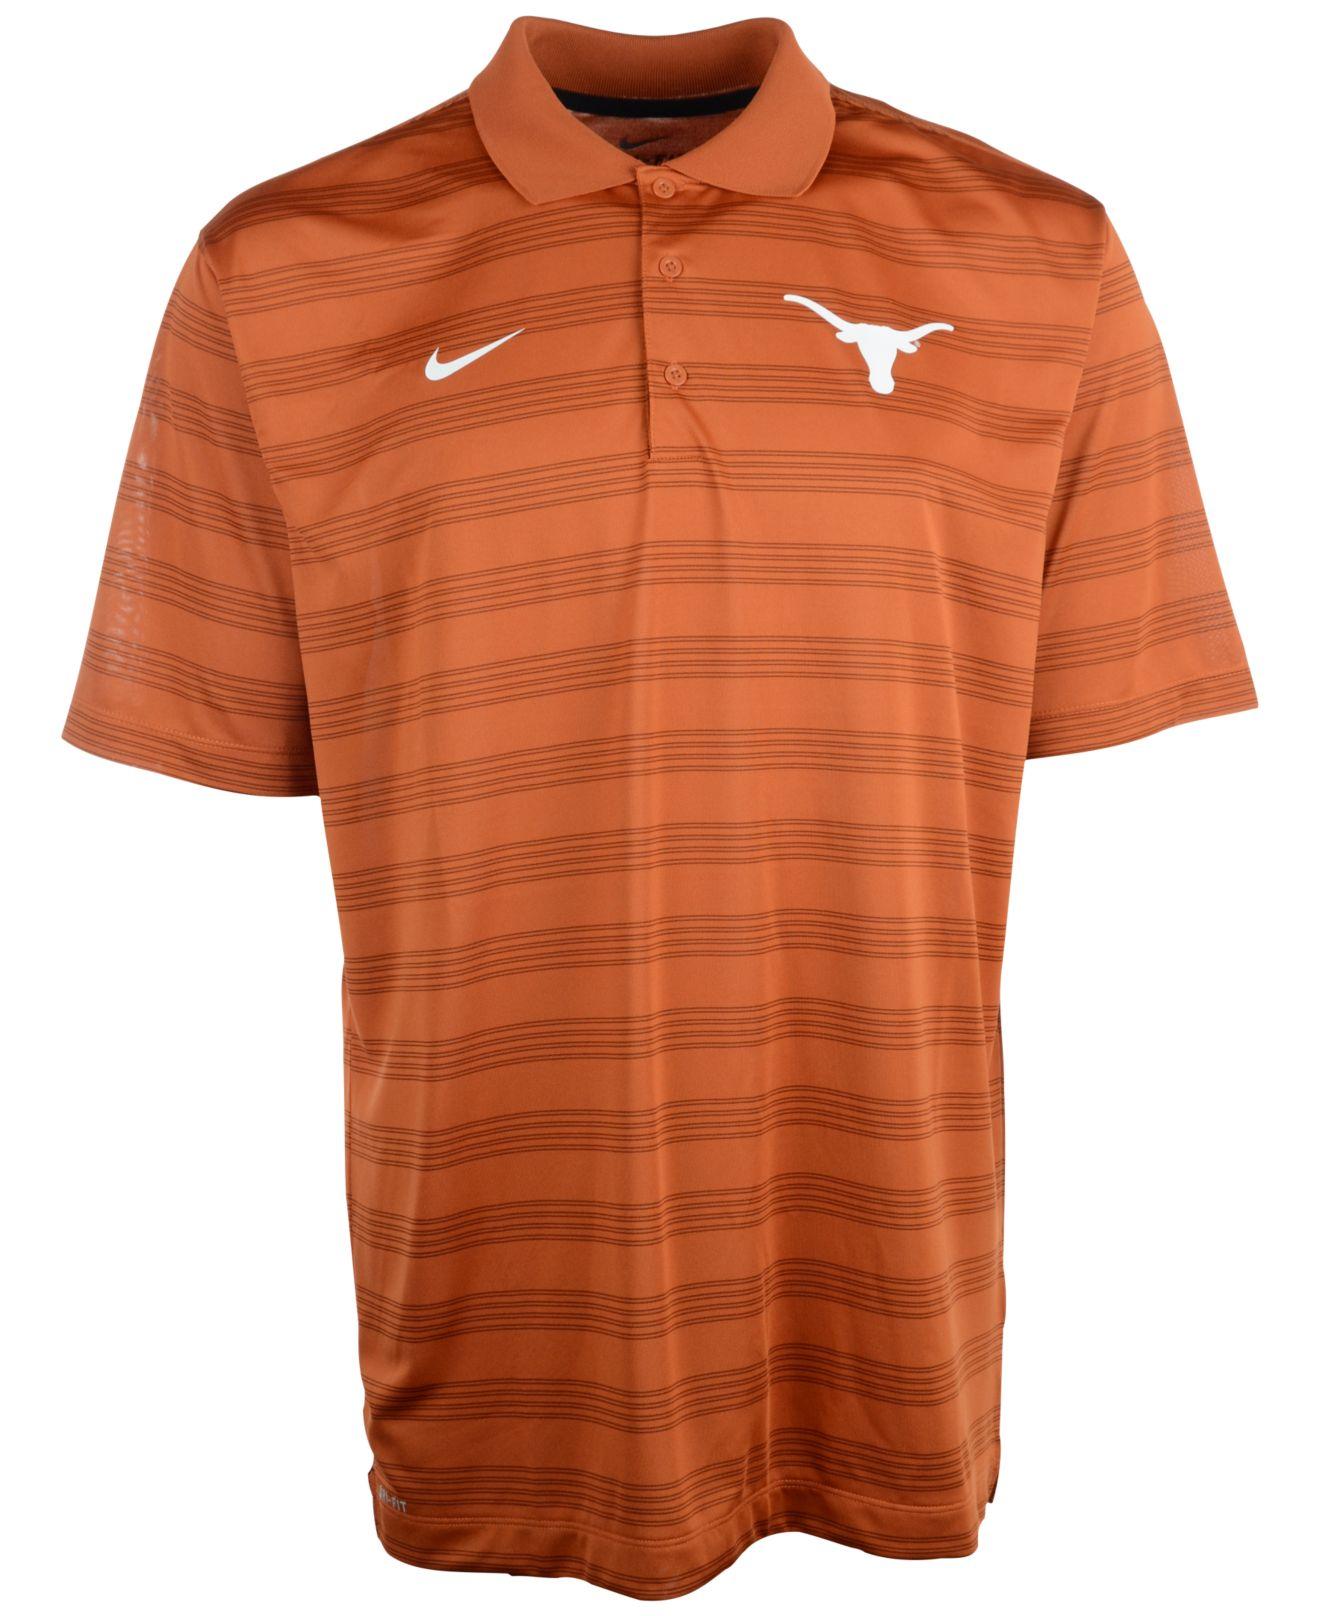 6e802c3c Nike Men's Texas Longhorns Dri-fit Preseason Polo Shirt in Orange ...